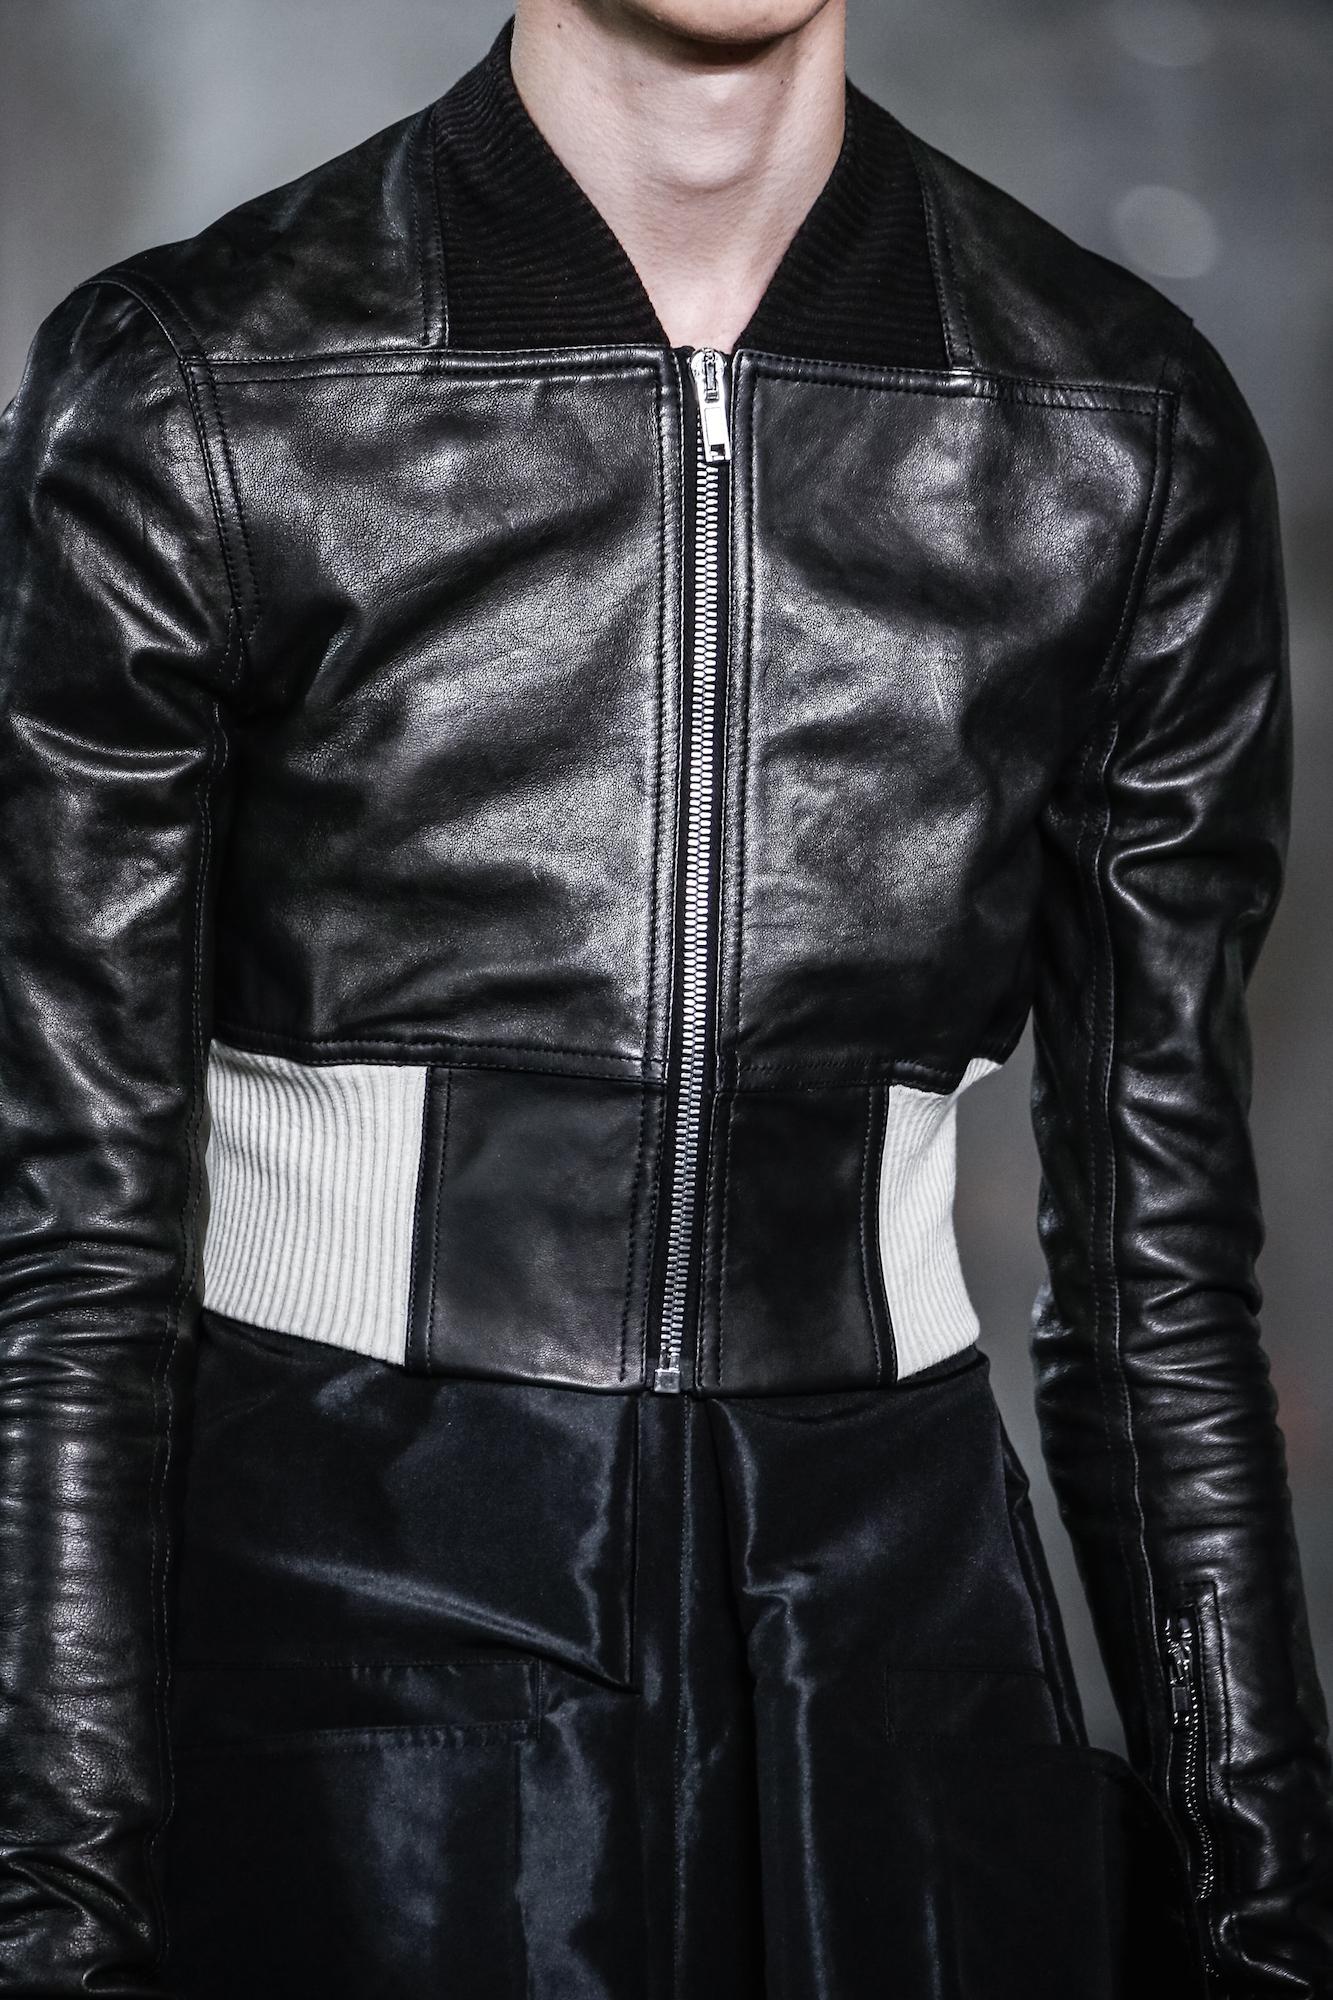 Original 21 jacket